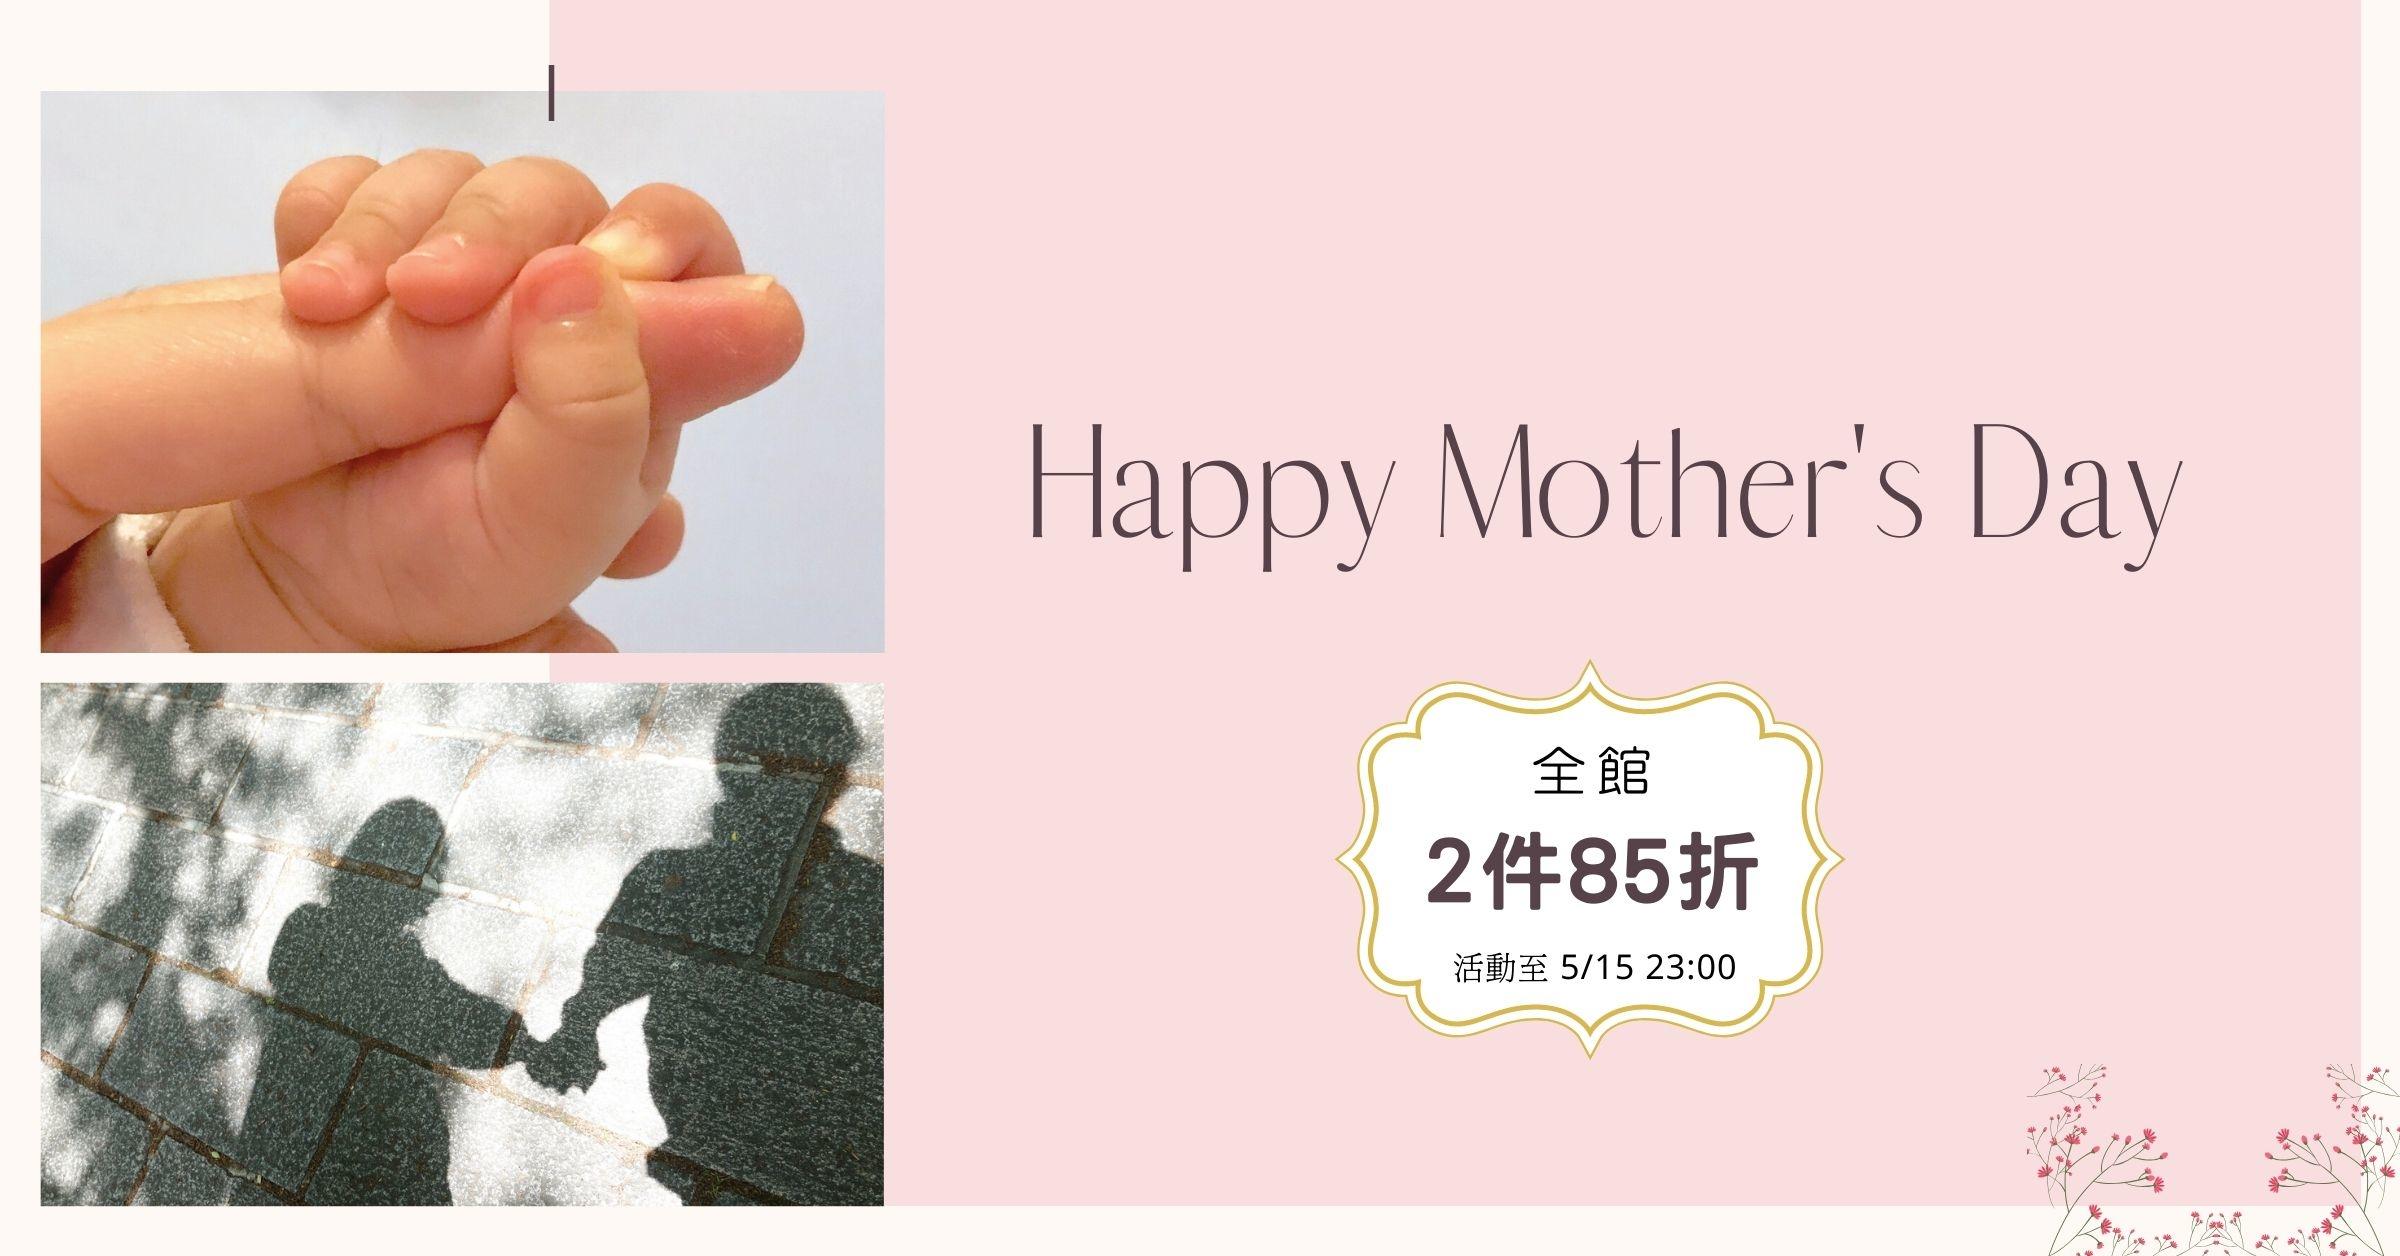 O-LIWAY 台灣製針織衫母親節活動